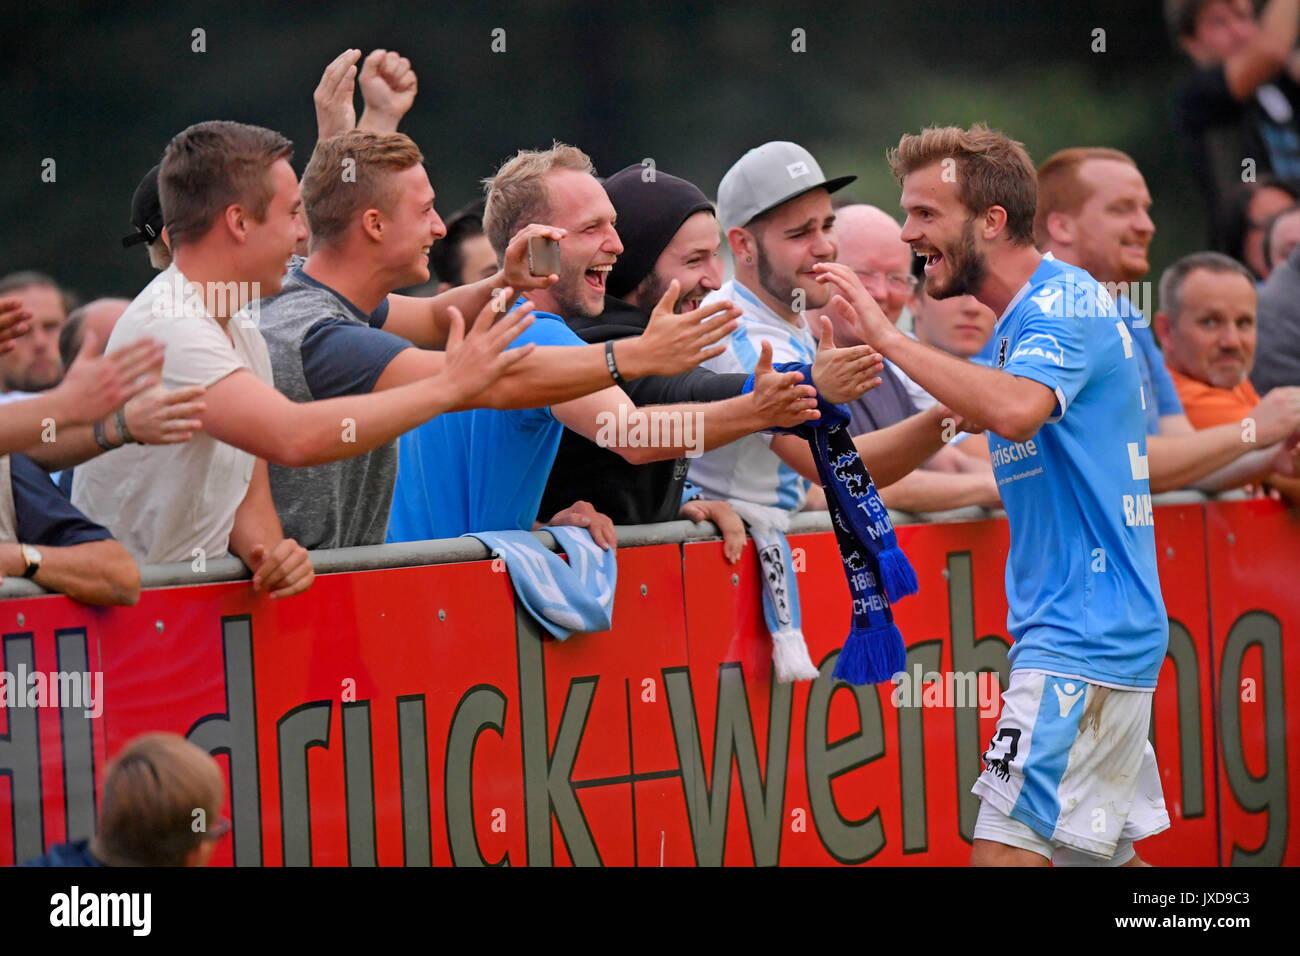 09.08.2017, Fussball Toto-Pokal 2017/2018, VfR Neuburg - TSV 1860 München, im Stadion in Neuburg an der Donau. Felix Bachschmid (TSV 1860 München) Torjubel. Photo: Cronos/MIS - Stock Image